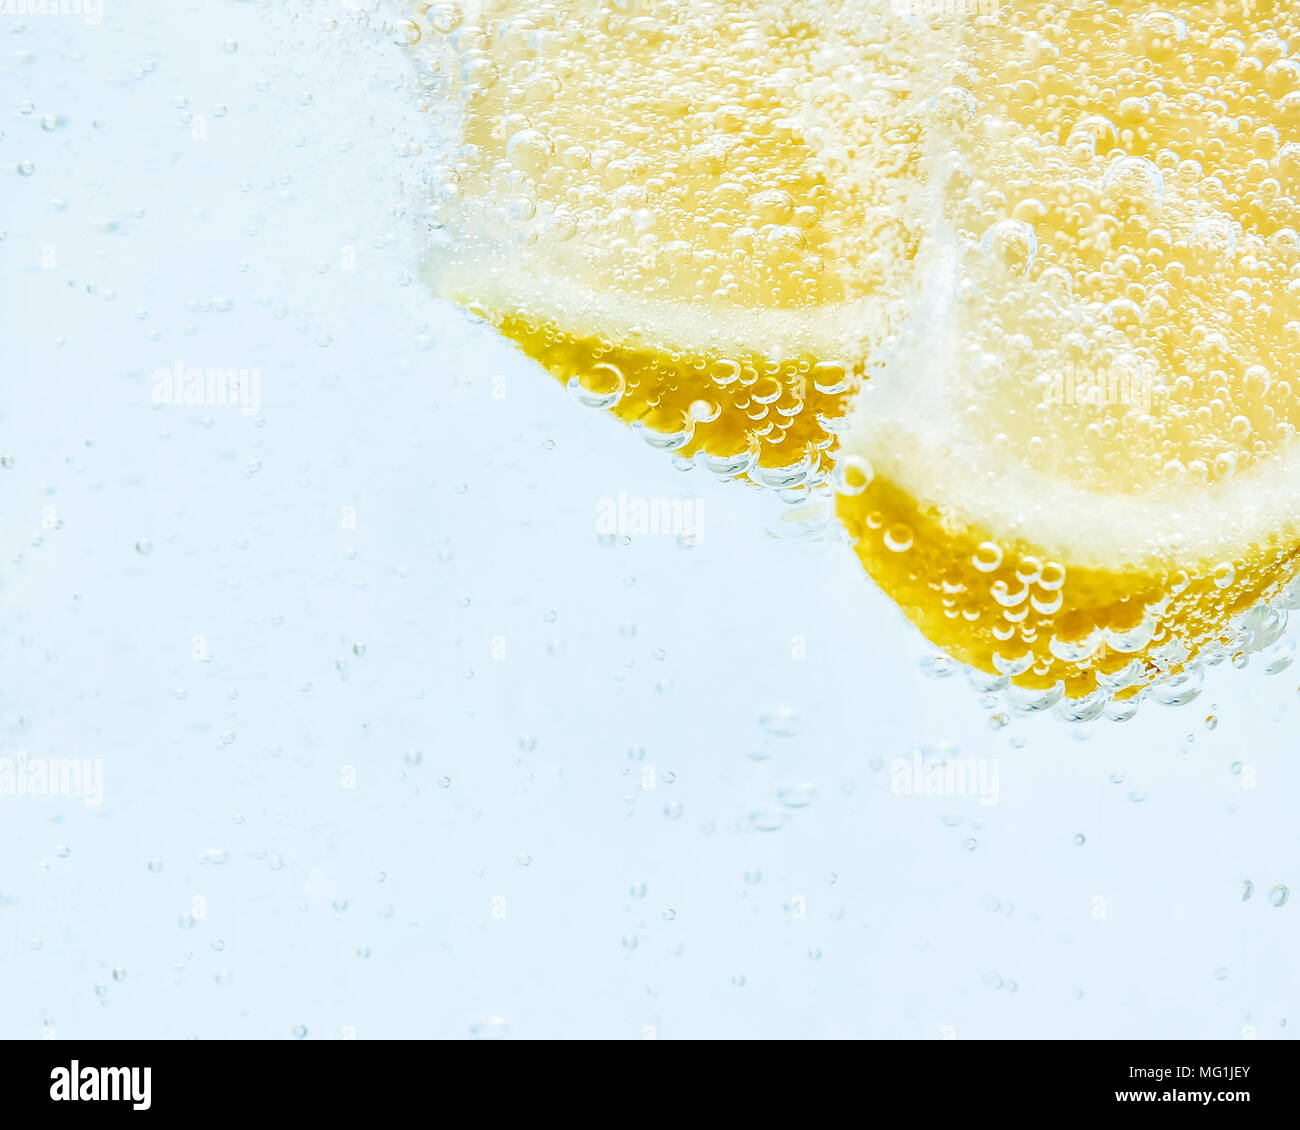 in soda, two slices of fresh juicy lemon. - Stock Image